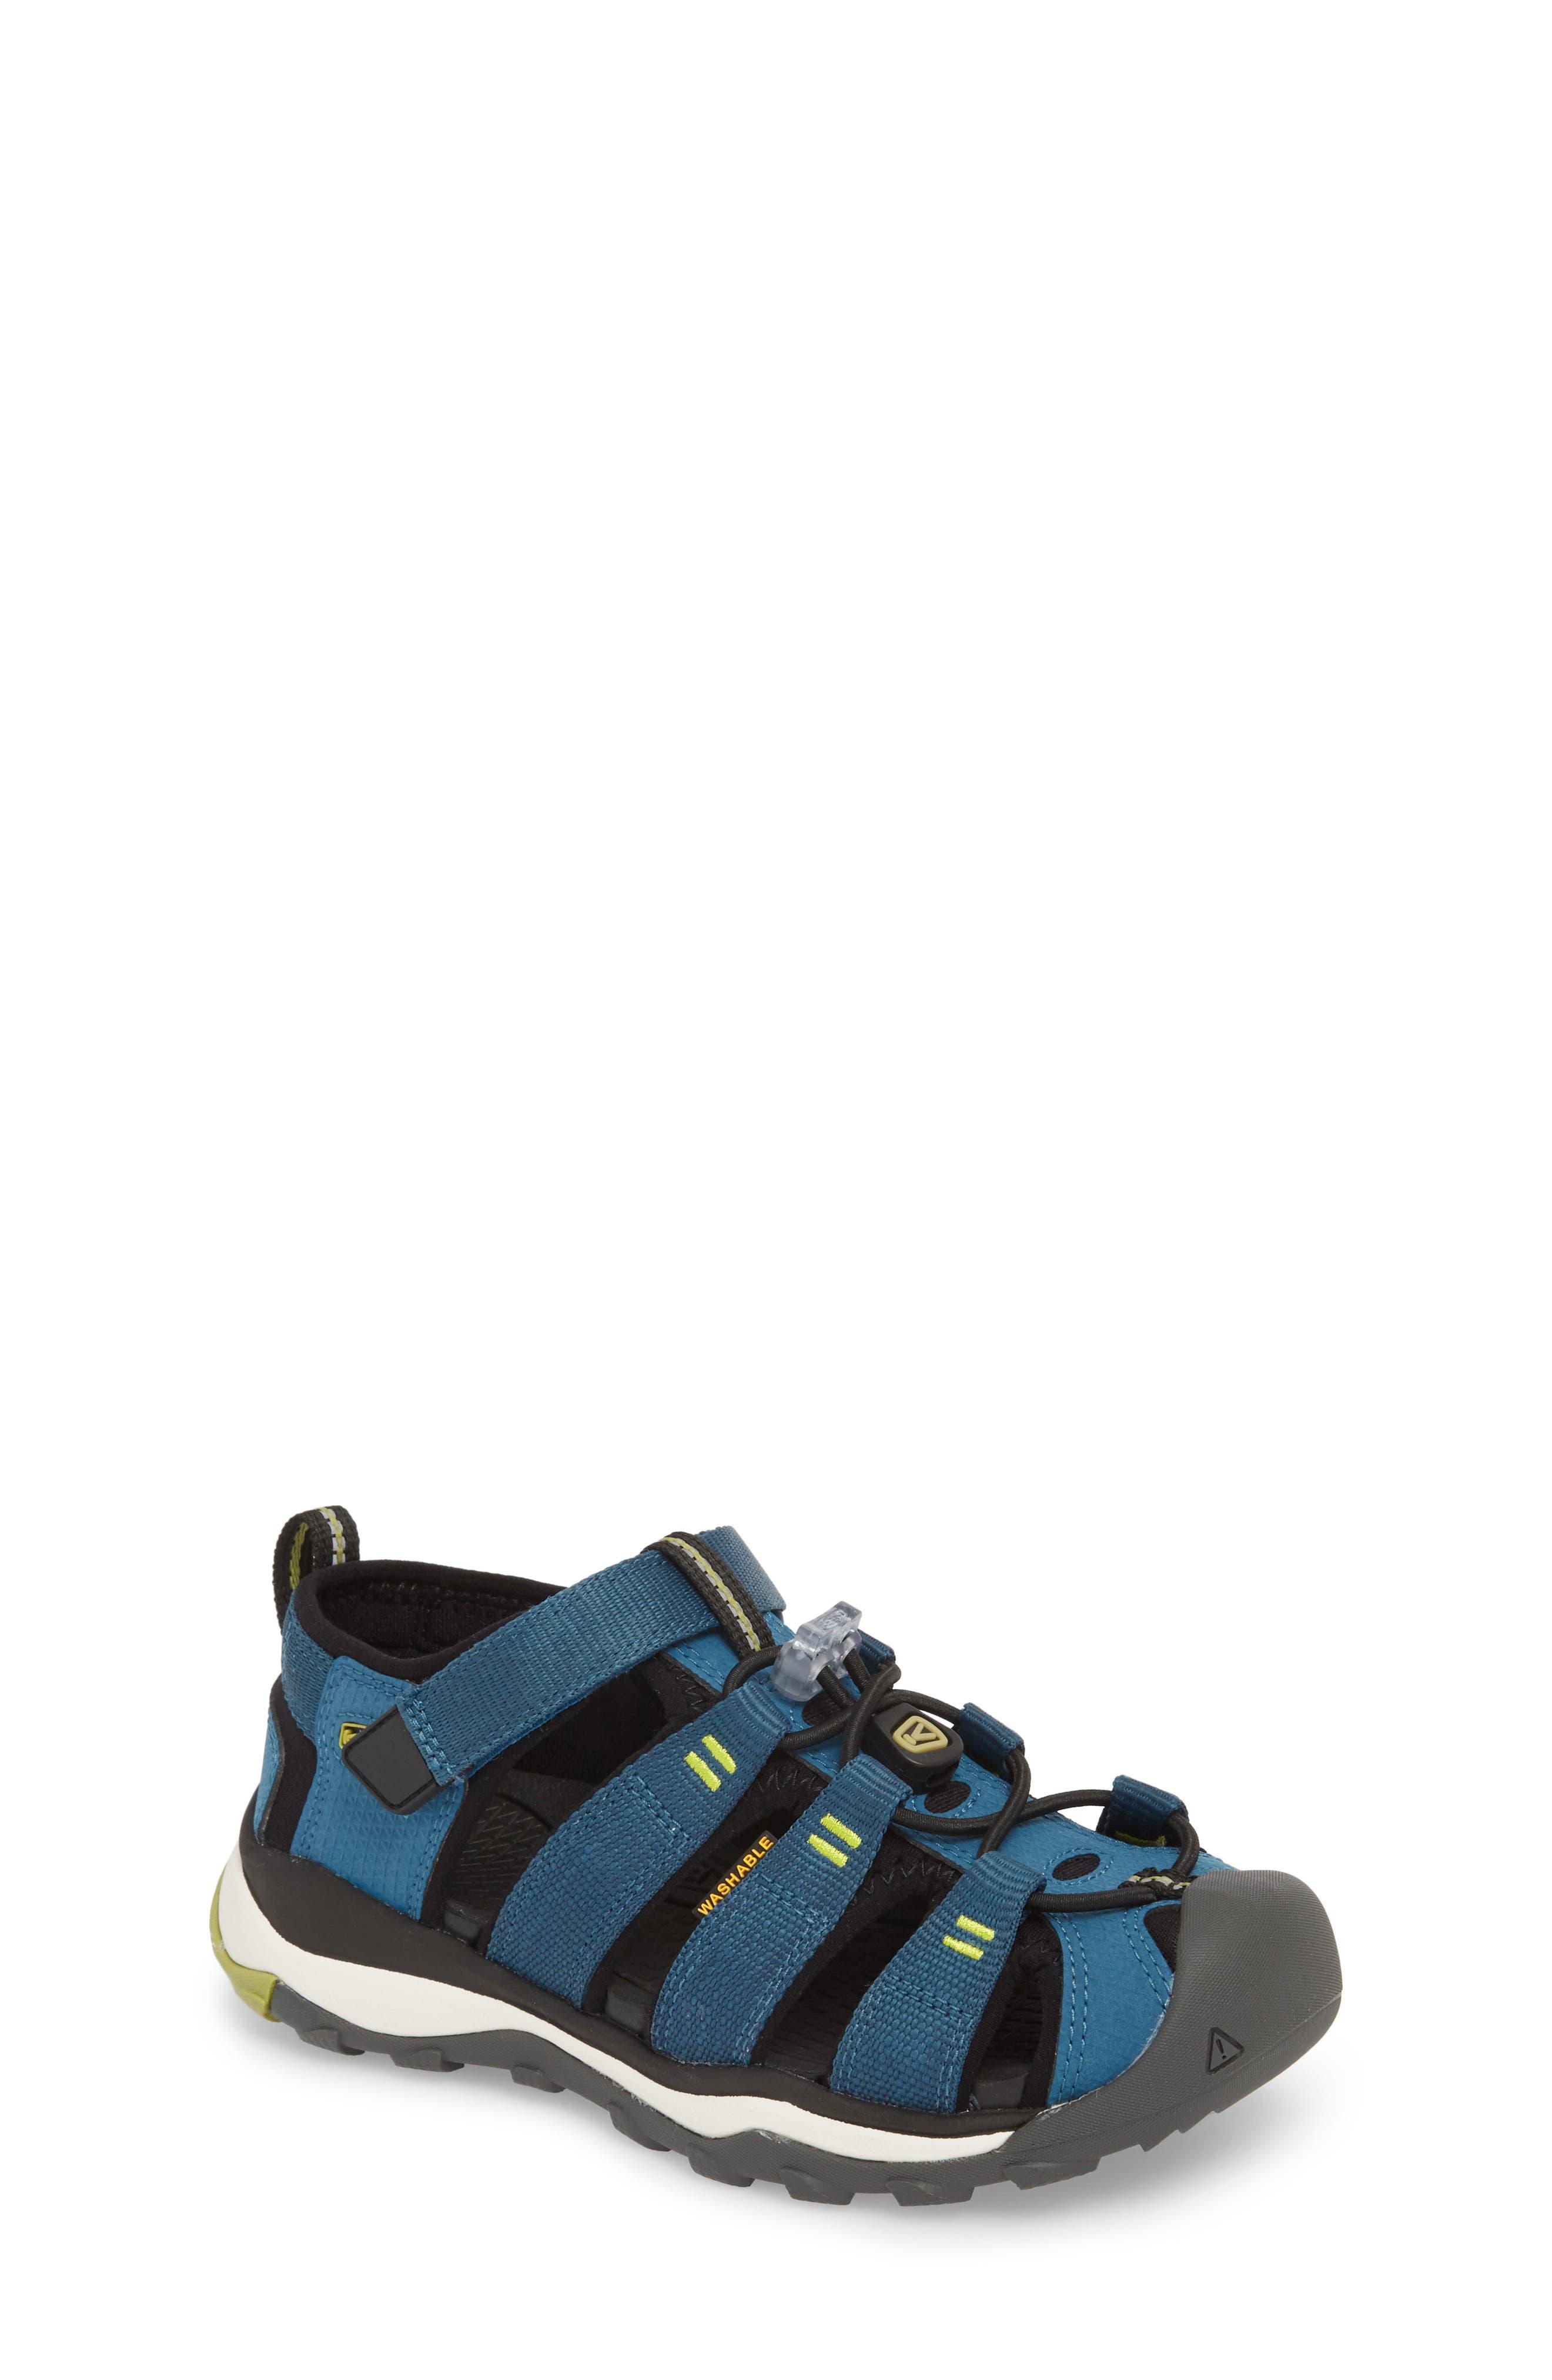 Newport Neo H2 Water Friendly Sandal,                             Main thumbnail 1, color,                             LEGION BLUE/ MOSS